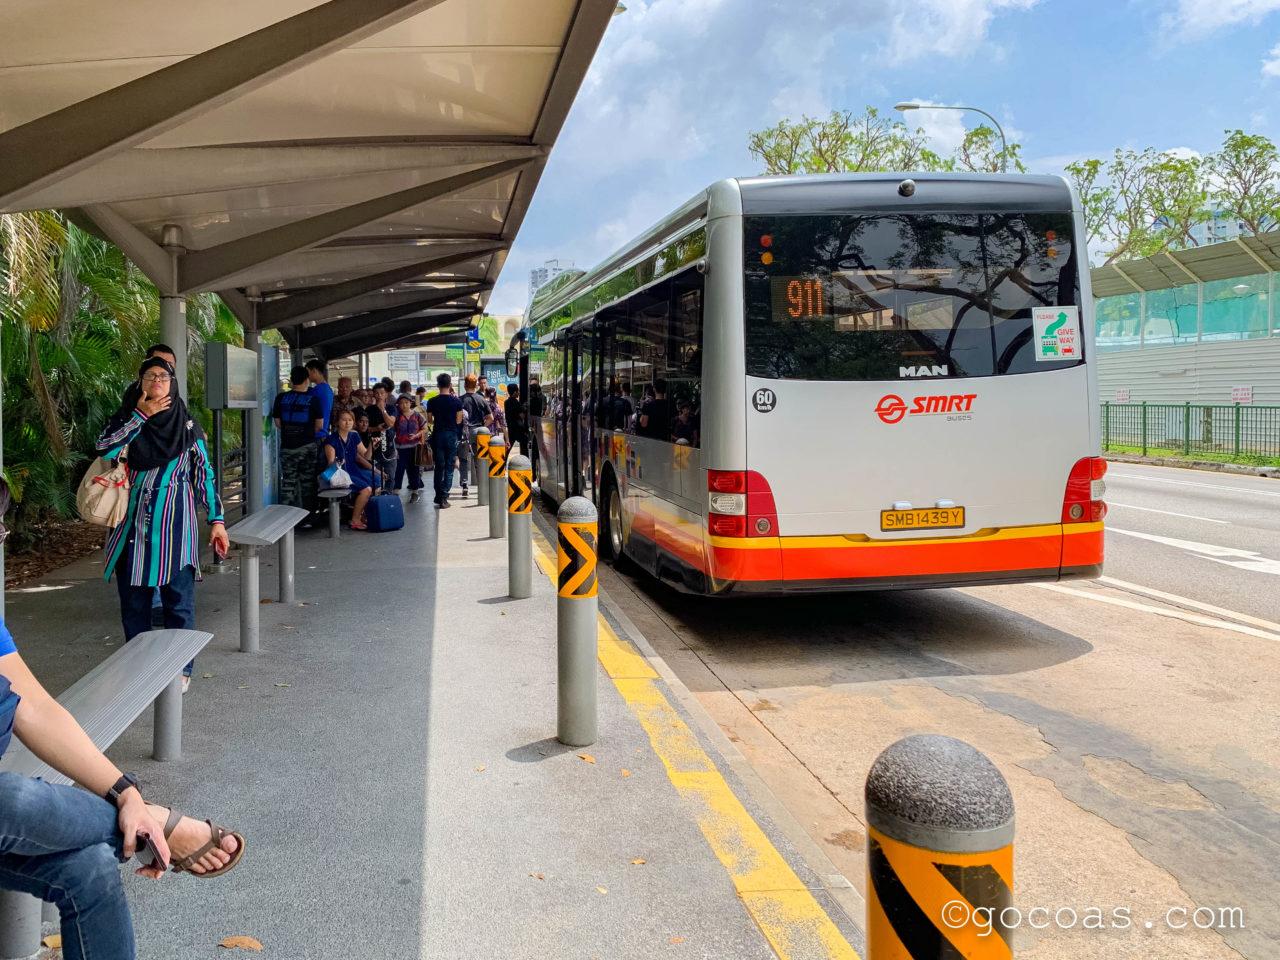 Woodlands Train Checkpointのバス停に停車しているバスと集まっている乗客